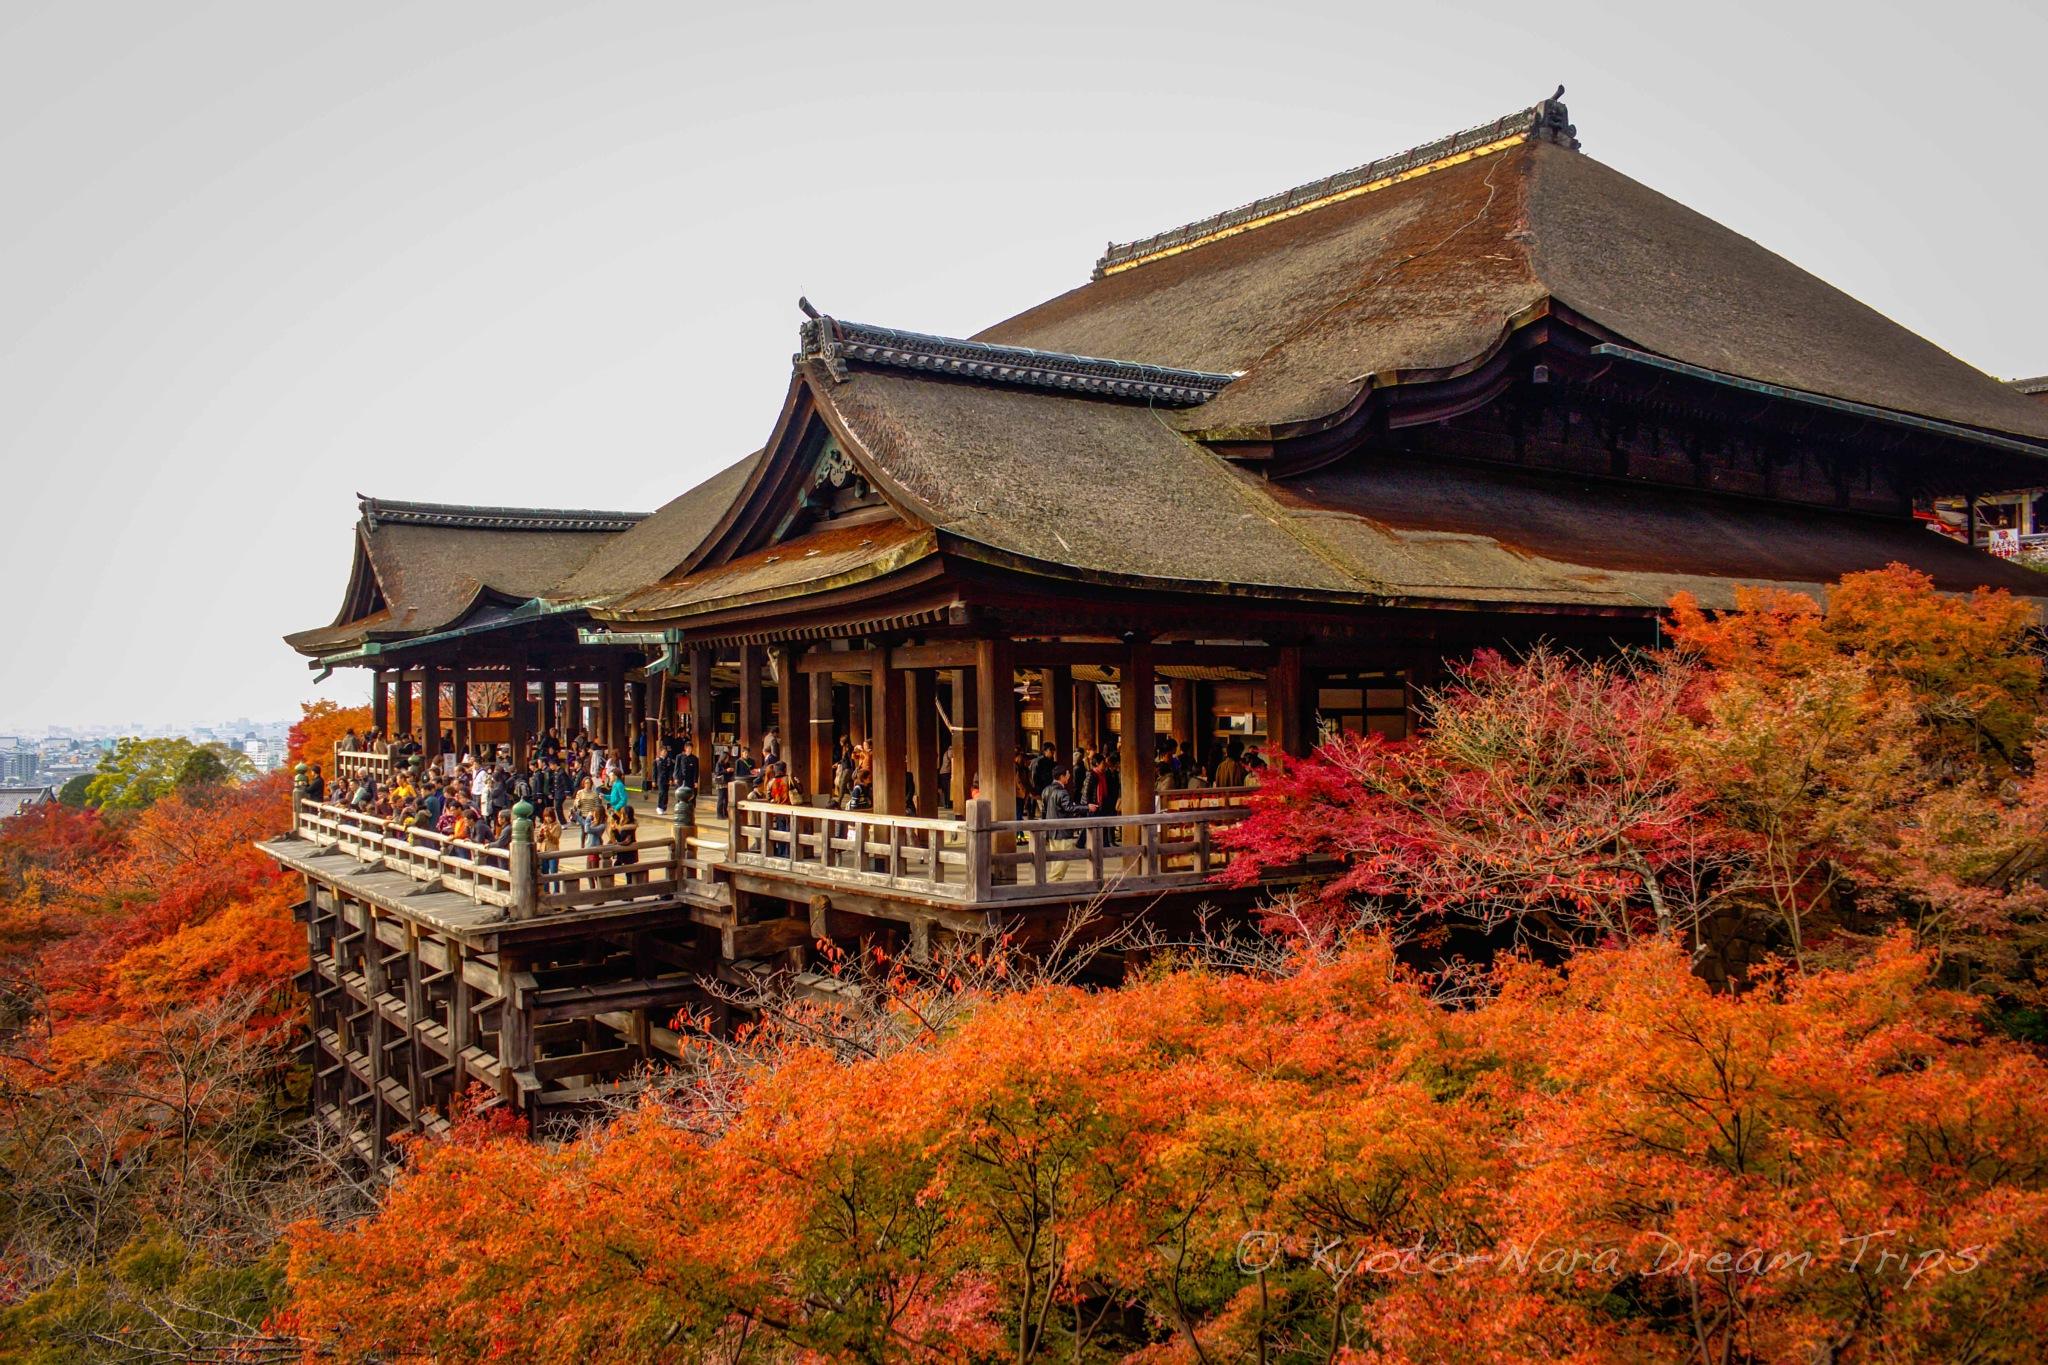 Kiyomizu Temple During the Autumn Season in Kyoto! by KyotoNaraDreamTrips